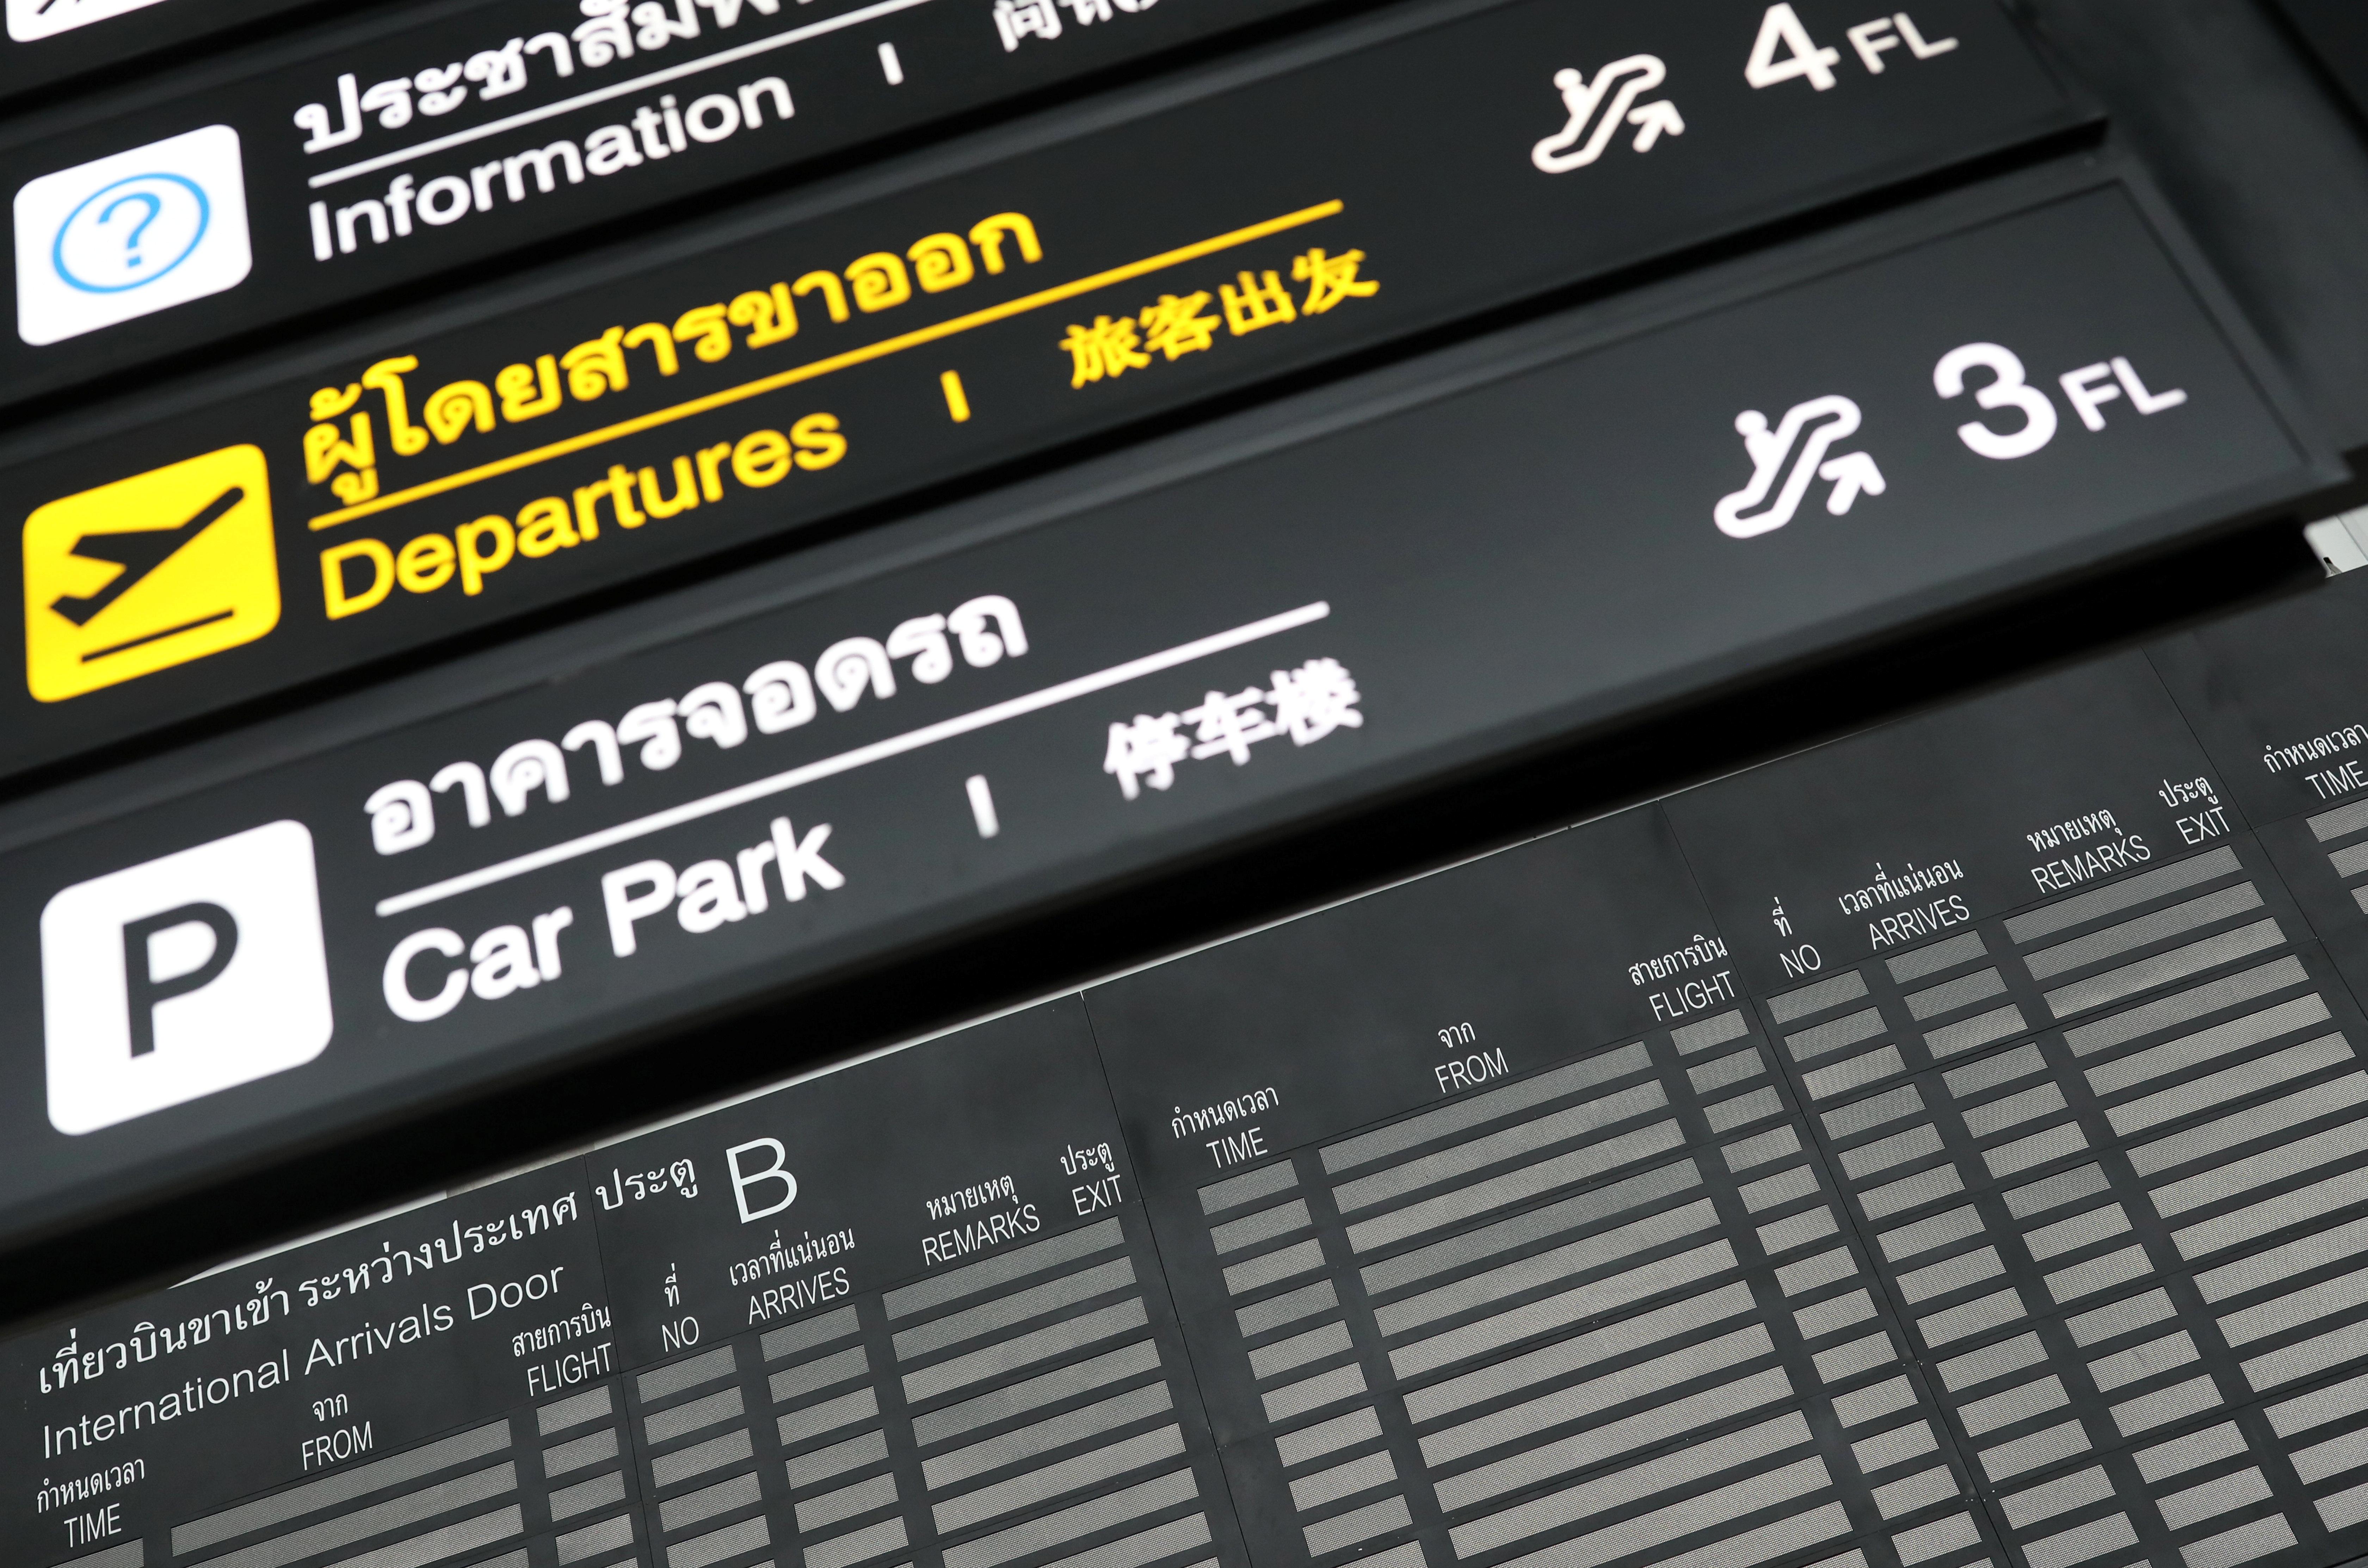 A blank flight information board is seen at Suvarnabhumi Airport during the coronavirus disease (COVID-19) pandemic in Bangkok, Thailand, October 12, 2020. REUTERS/Soe Zeya Tun